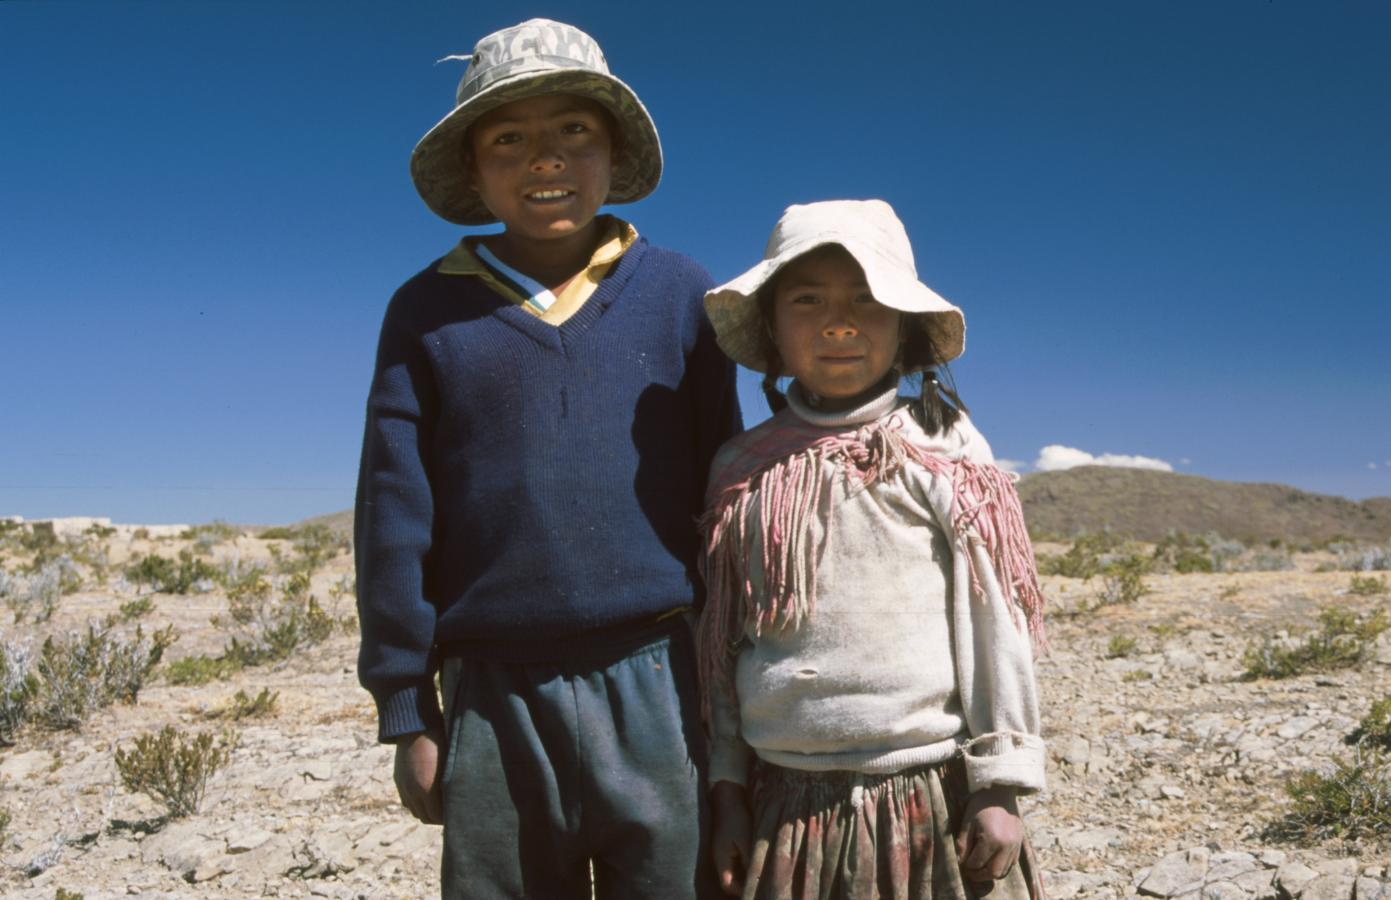 children-around-cusco-peru-2001